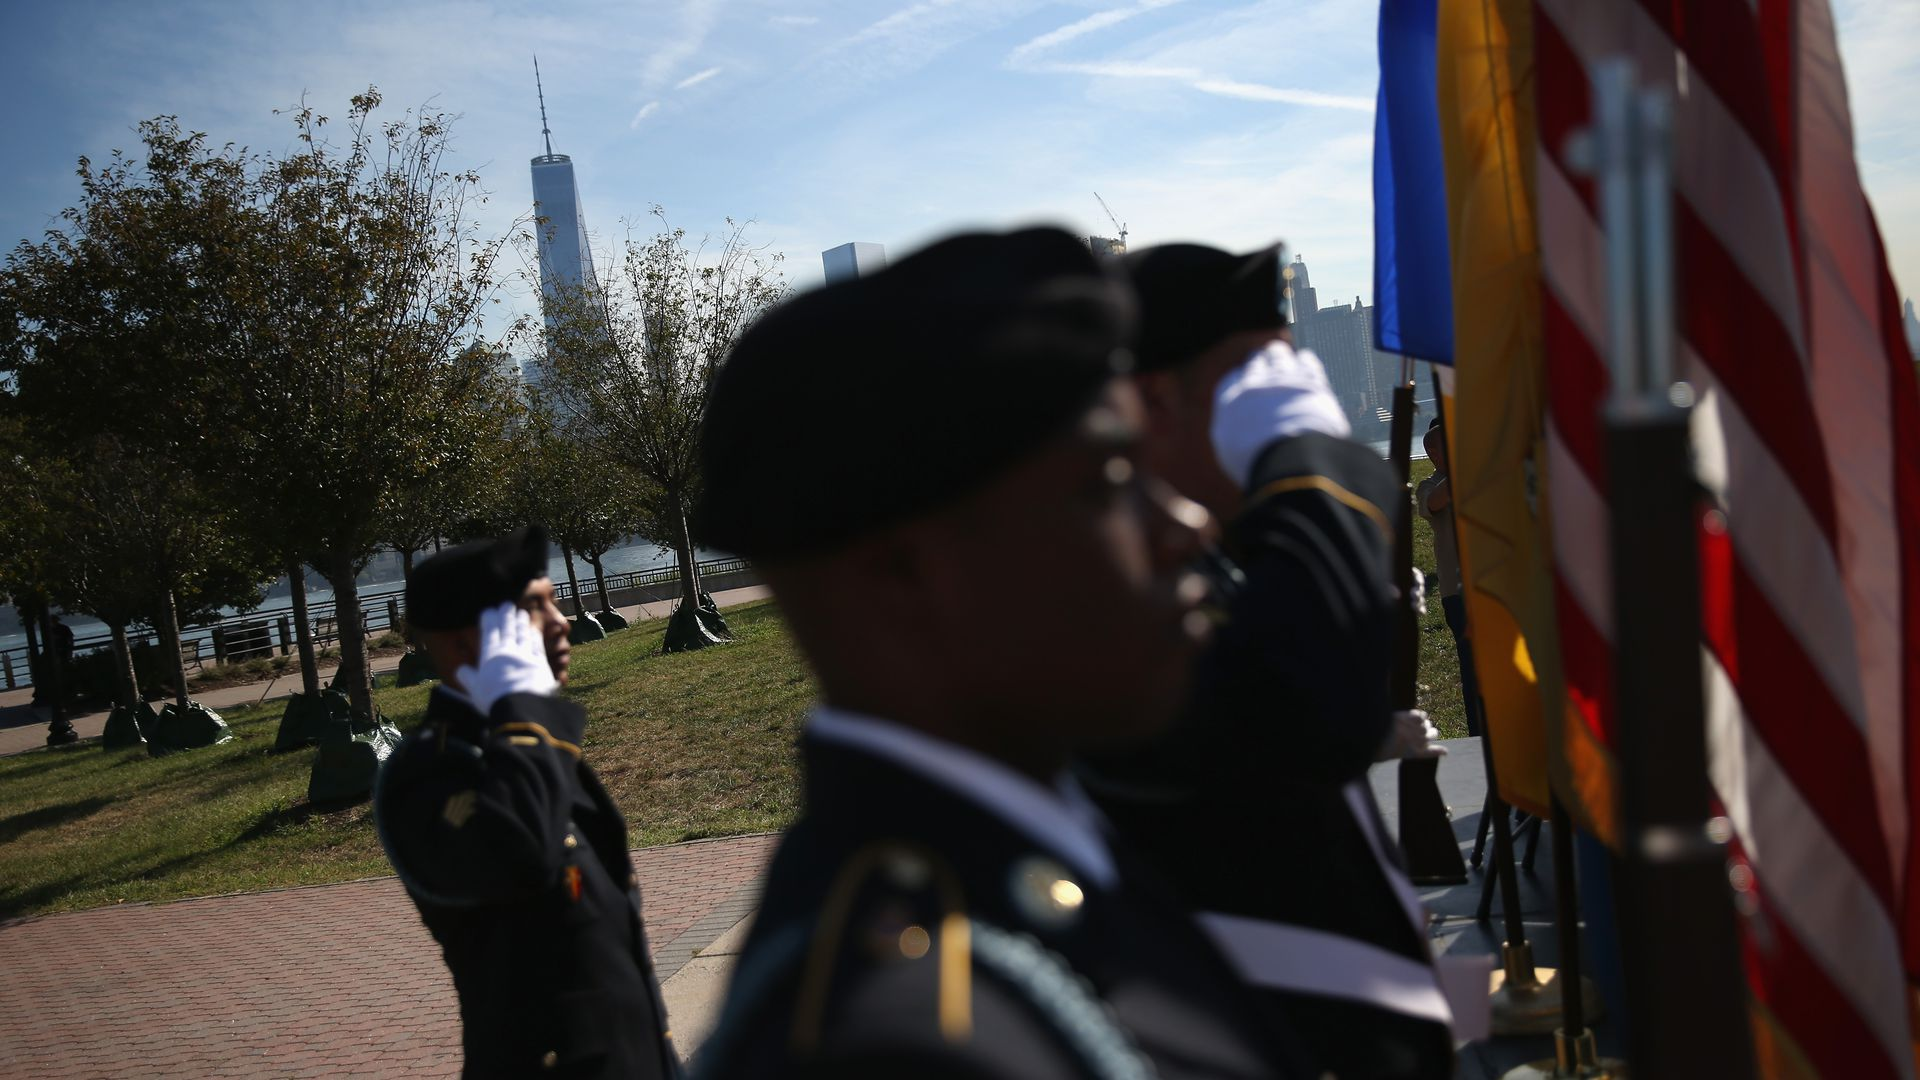 National Guard members saluting the flag.